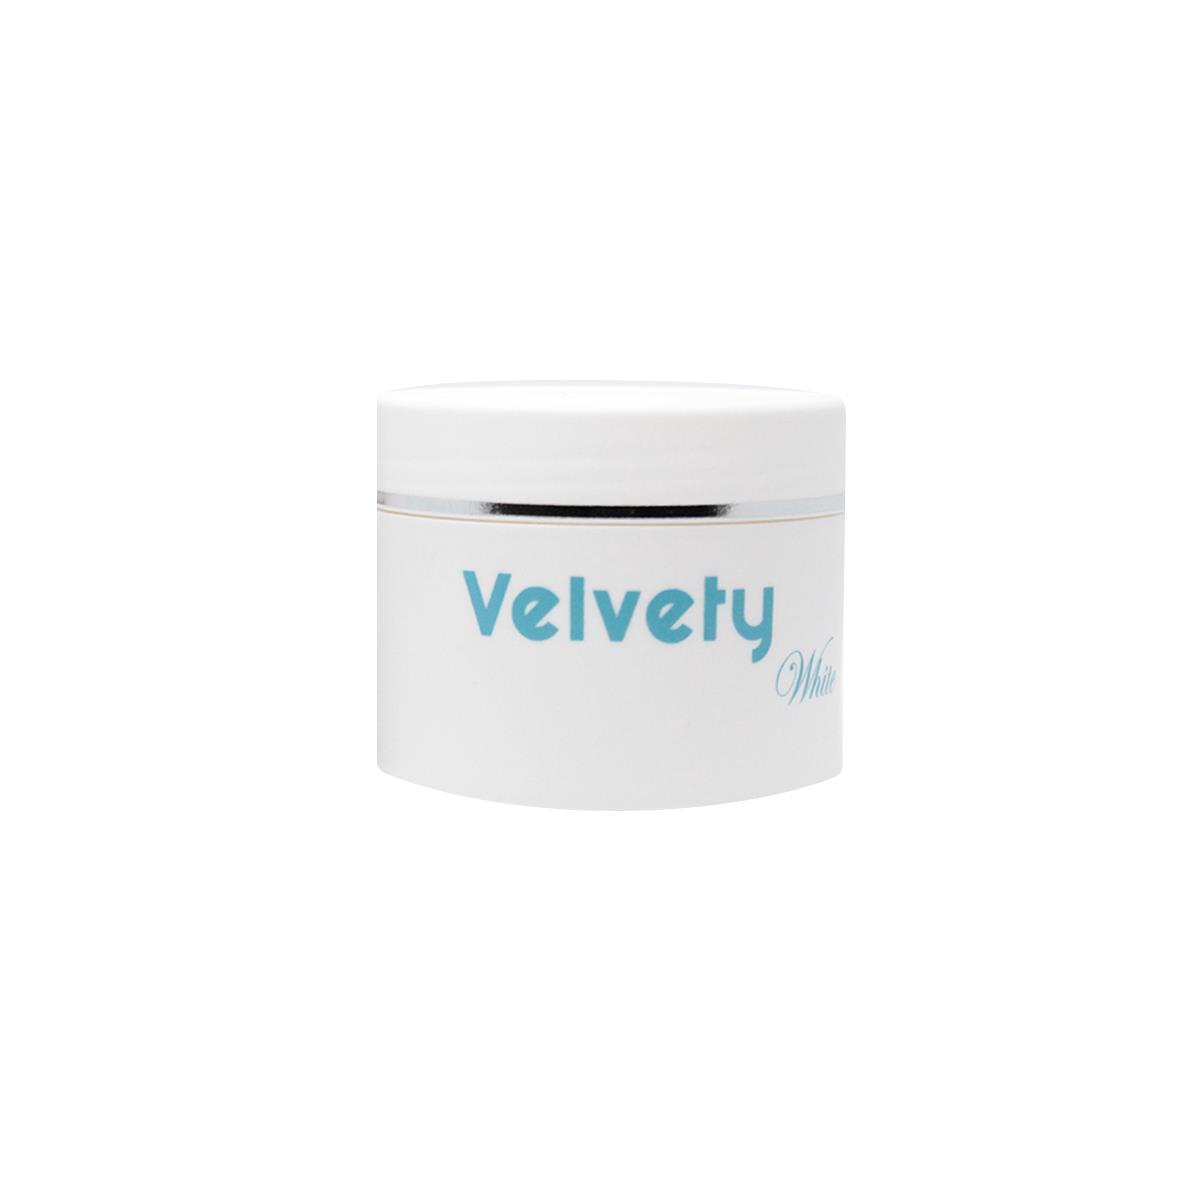 Velvety White Crema Despigmentante/ Aclaradora Frasco 50Ml